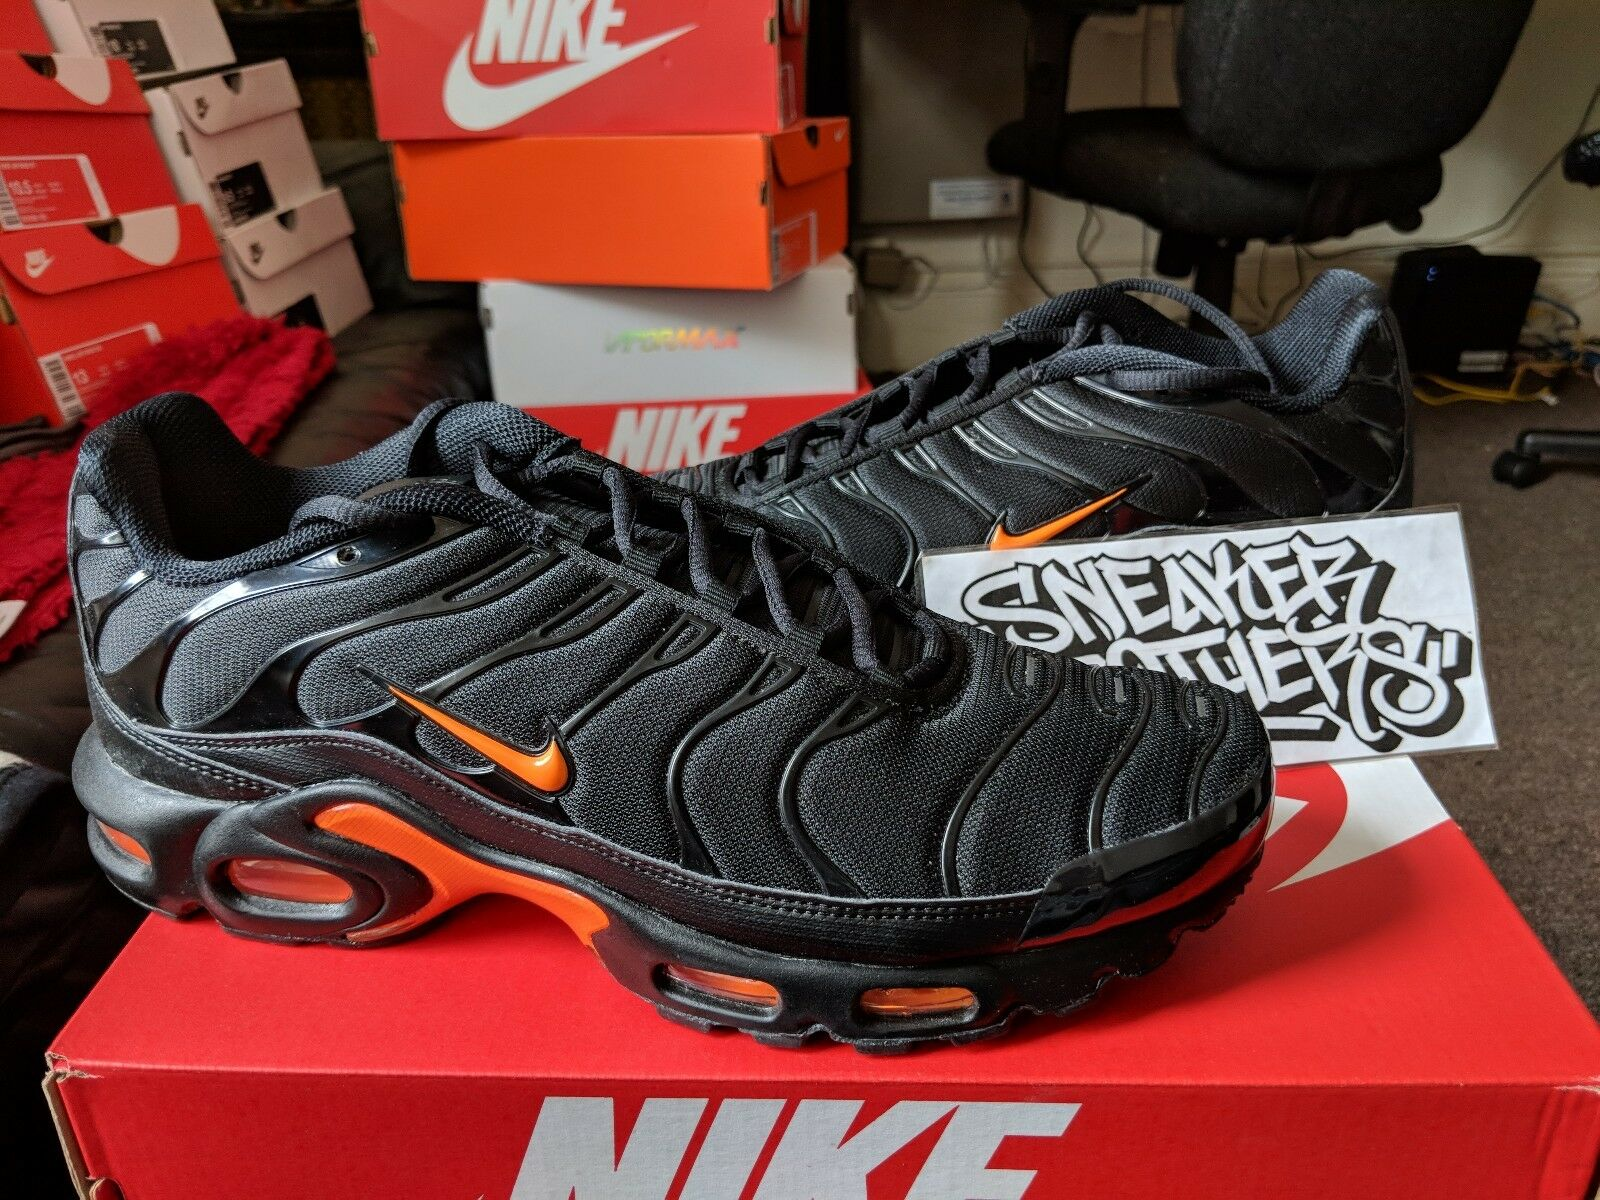 Nike Air Max Plus TN Tuned 1 Black Total Orange Yellow Running Men's AO9564-001